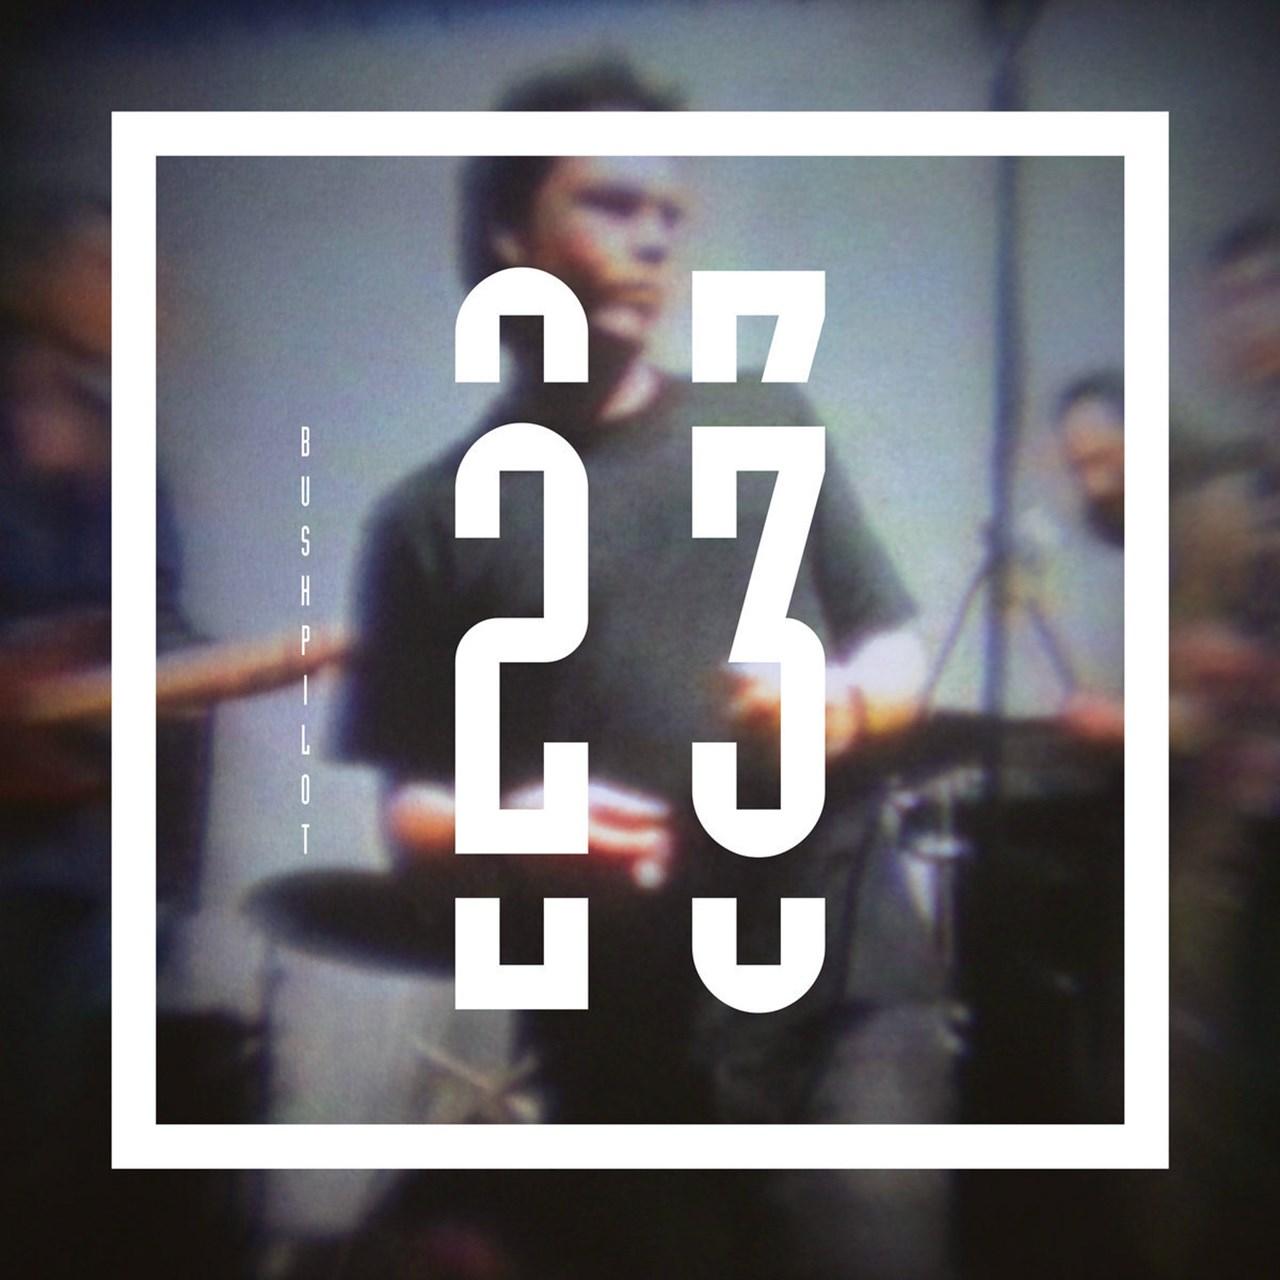 23 - 1